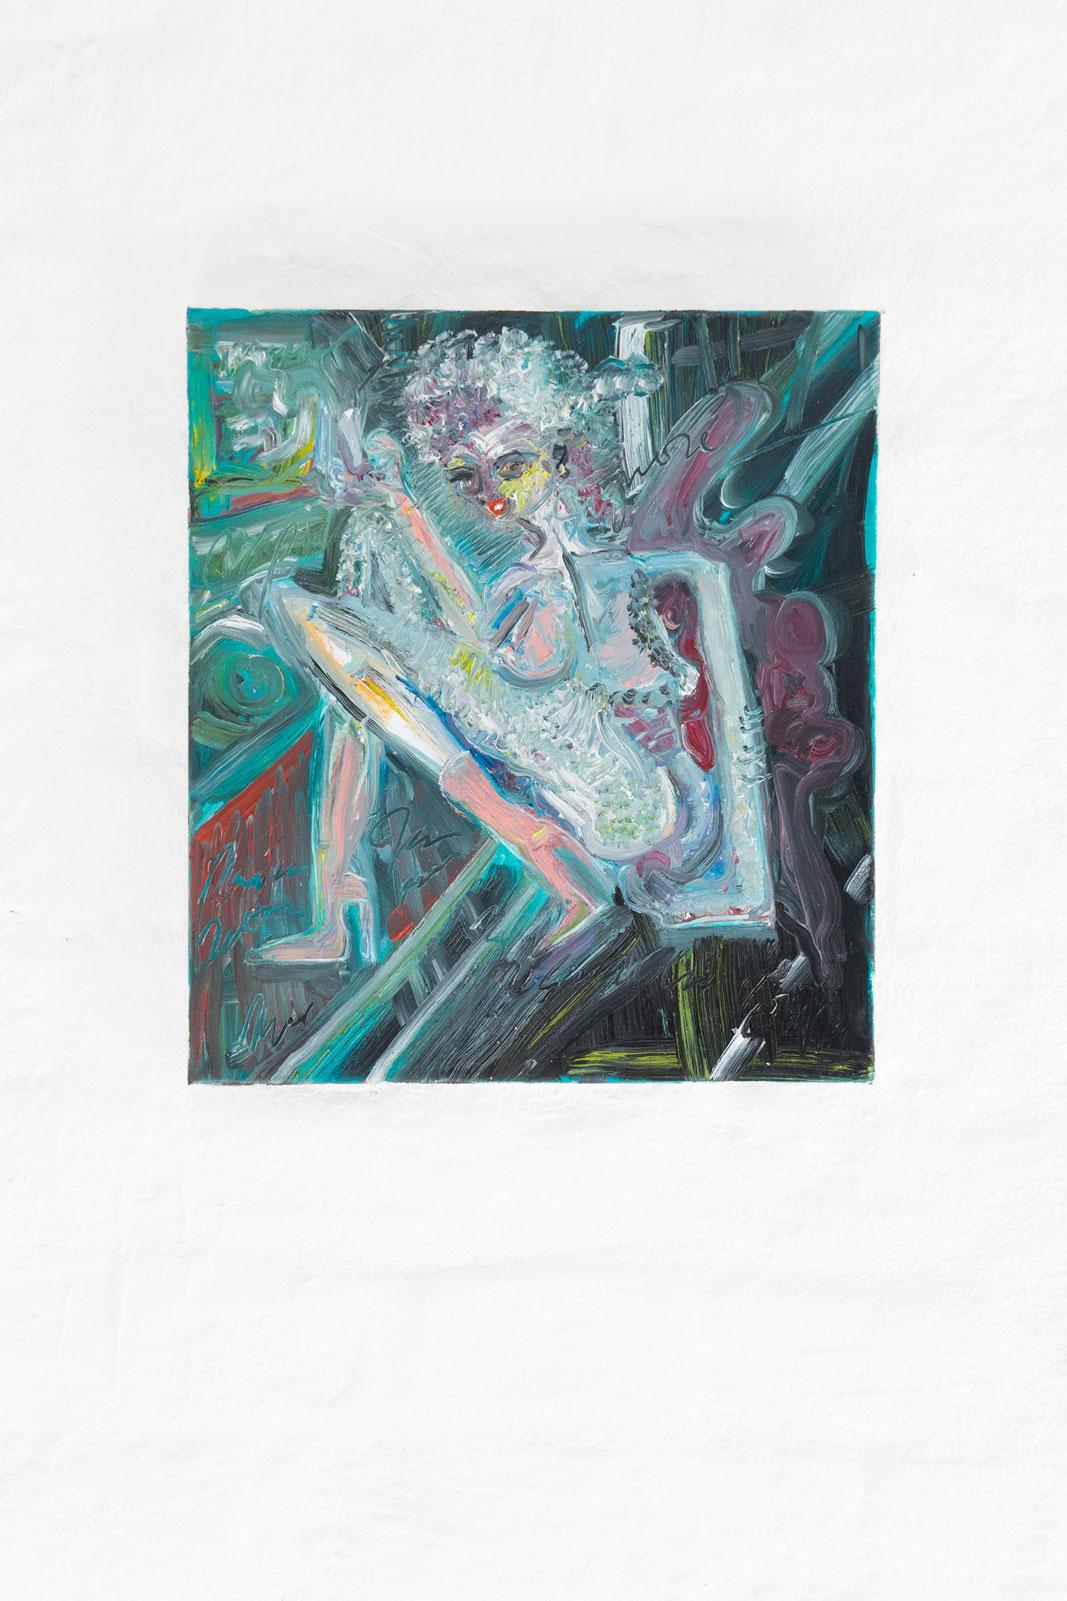 Joseph Geagan, La Guttersnipirina, 2018, Oil on canvas, 38 x 34 cm